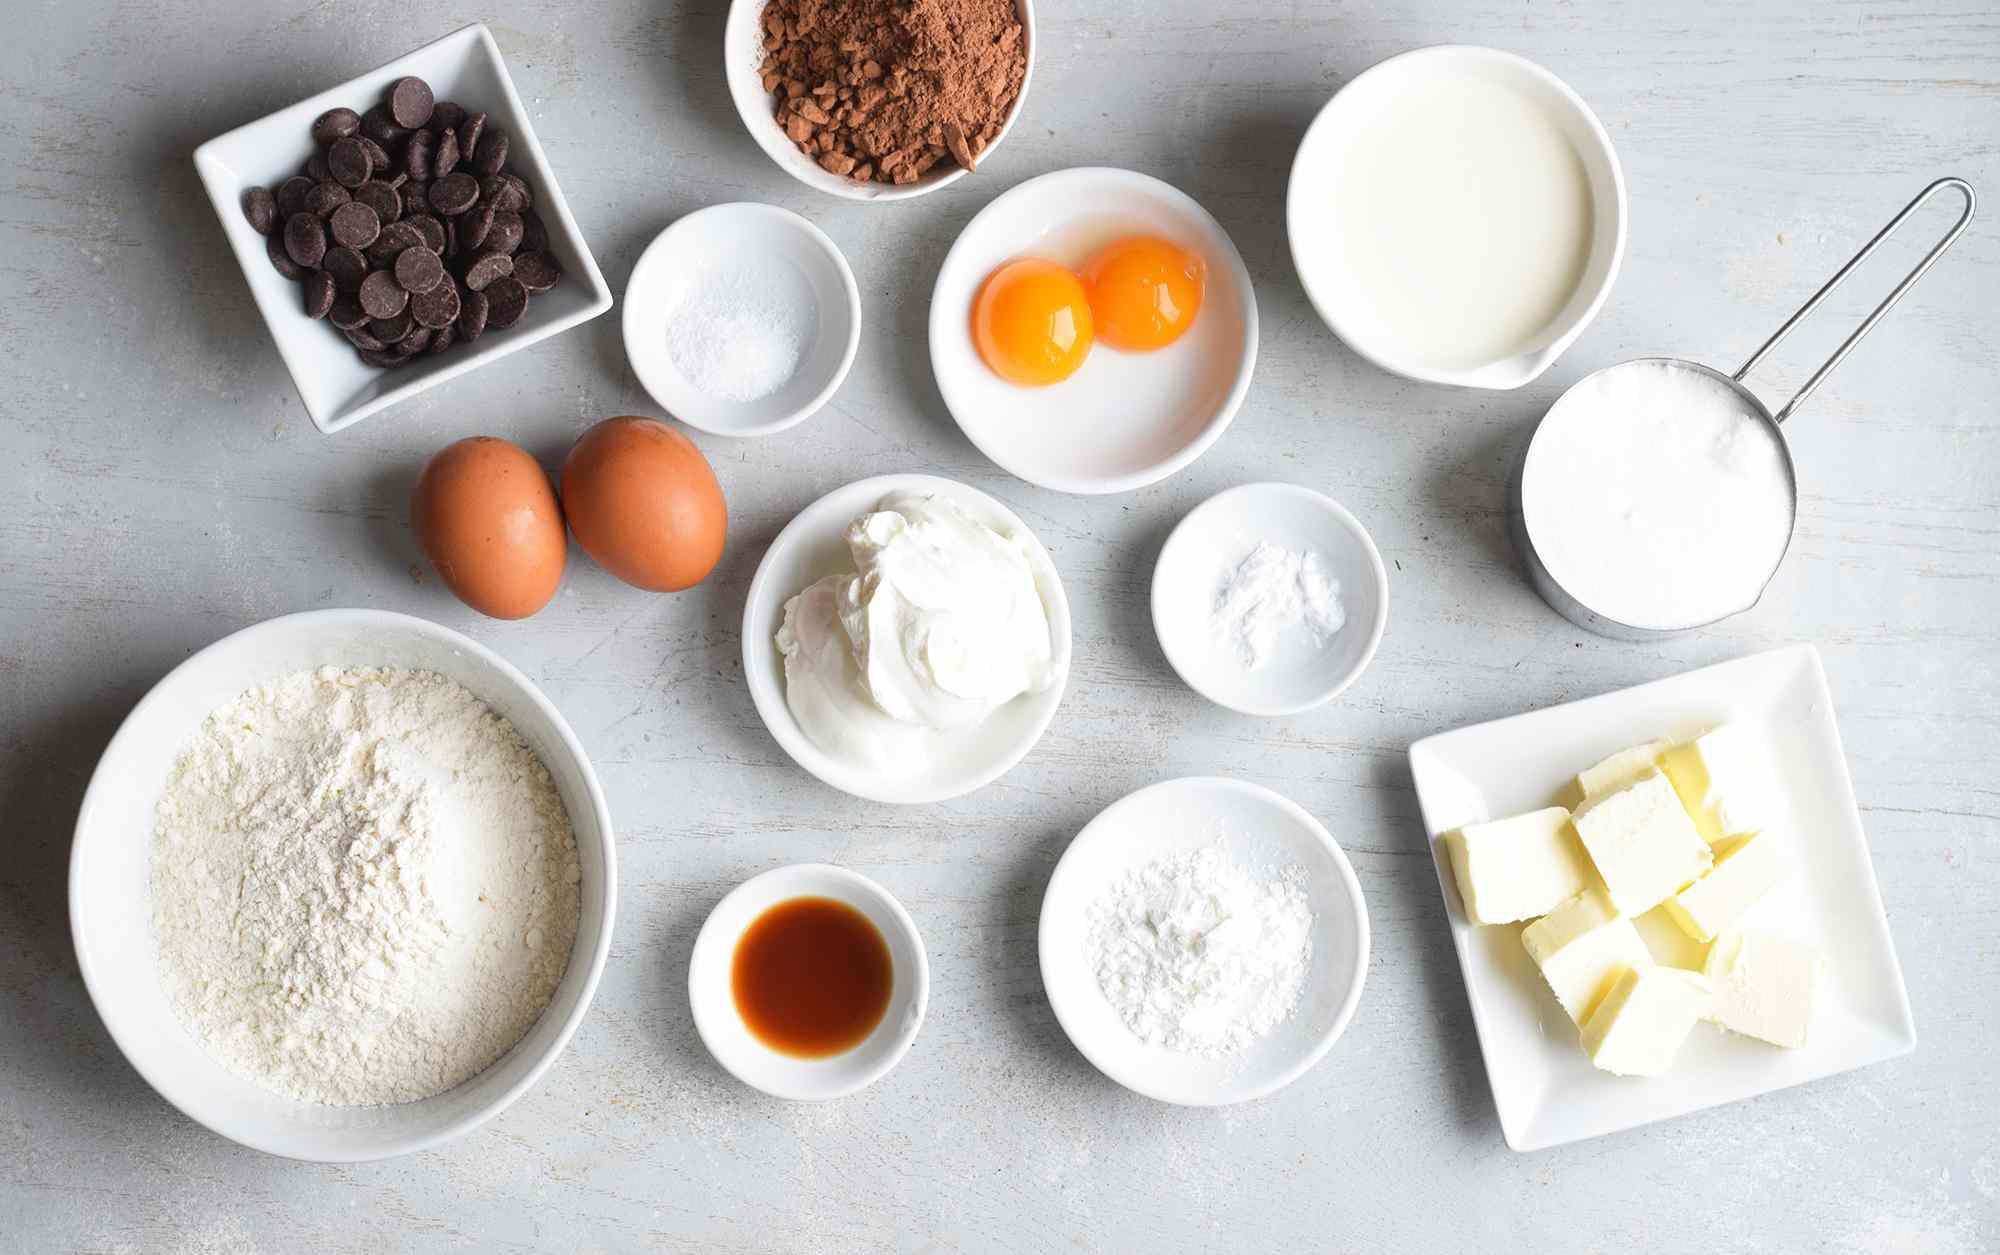 Football cupcake ingredients